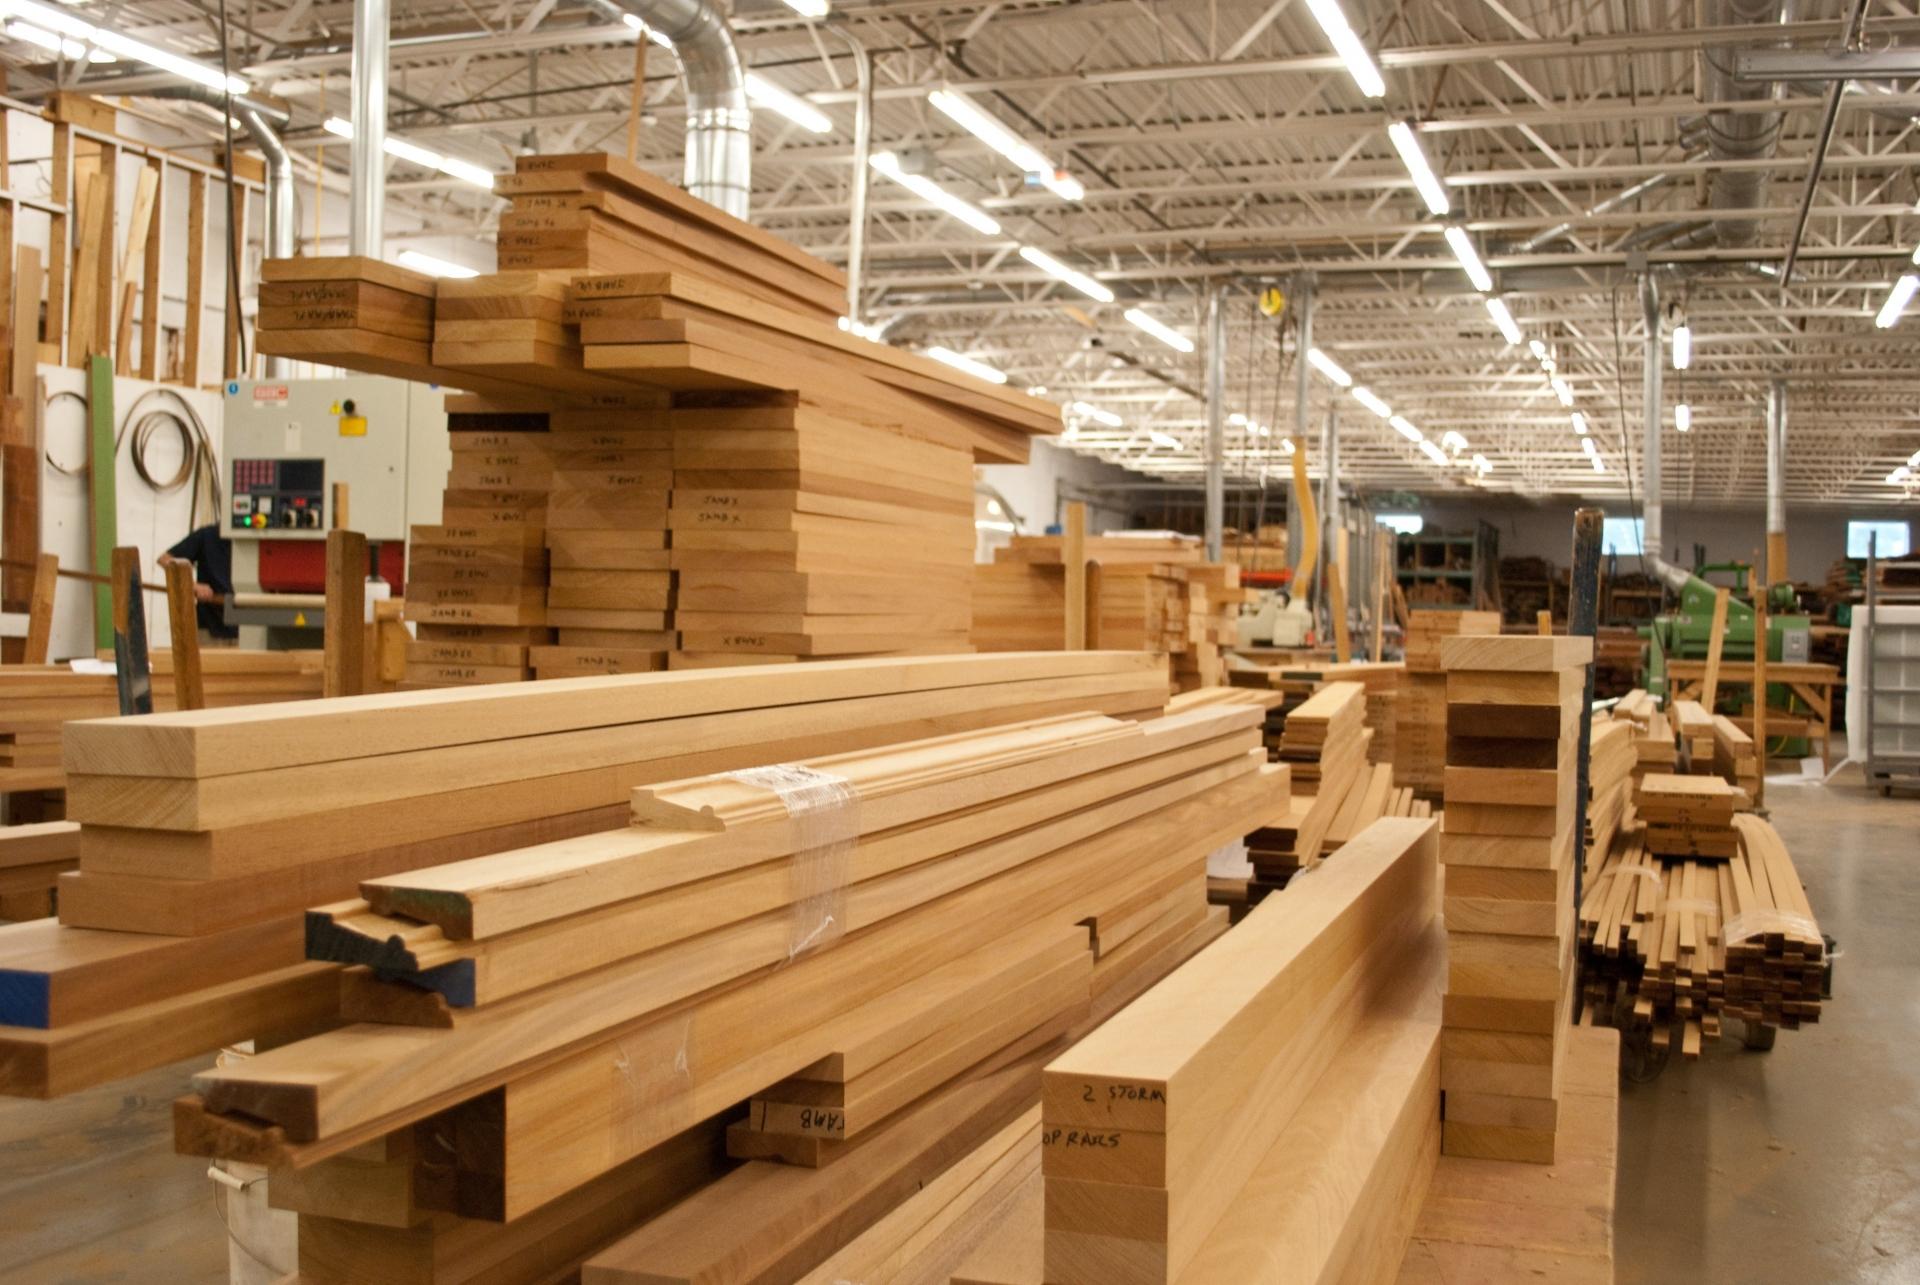 vietnams wood exports grow in anticipation of ukvfta